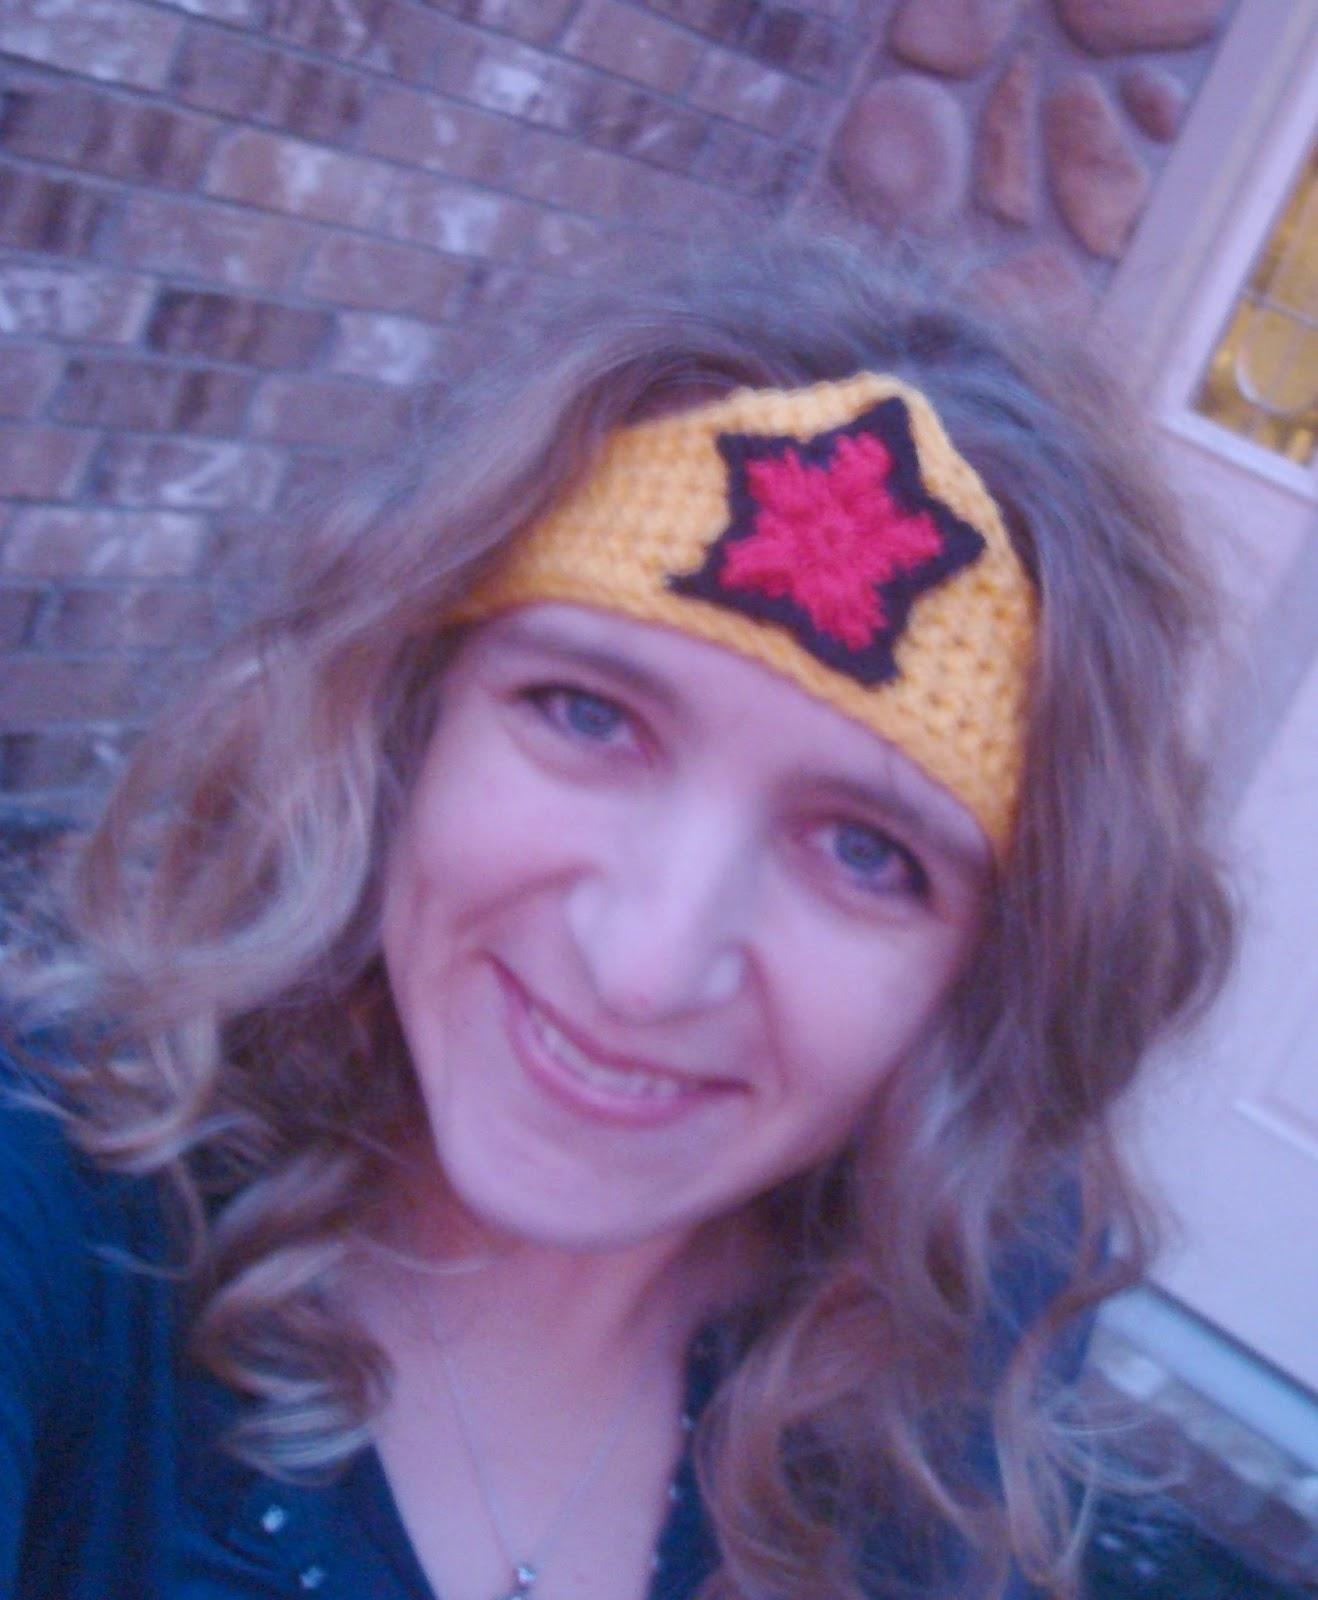 Wonder Woman Tiara | Institch Gratification